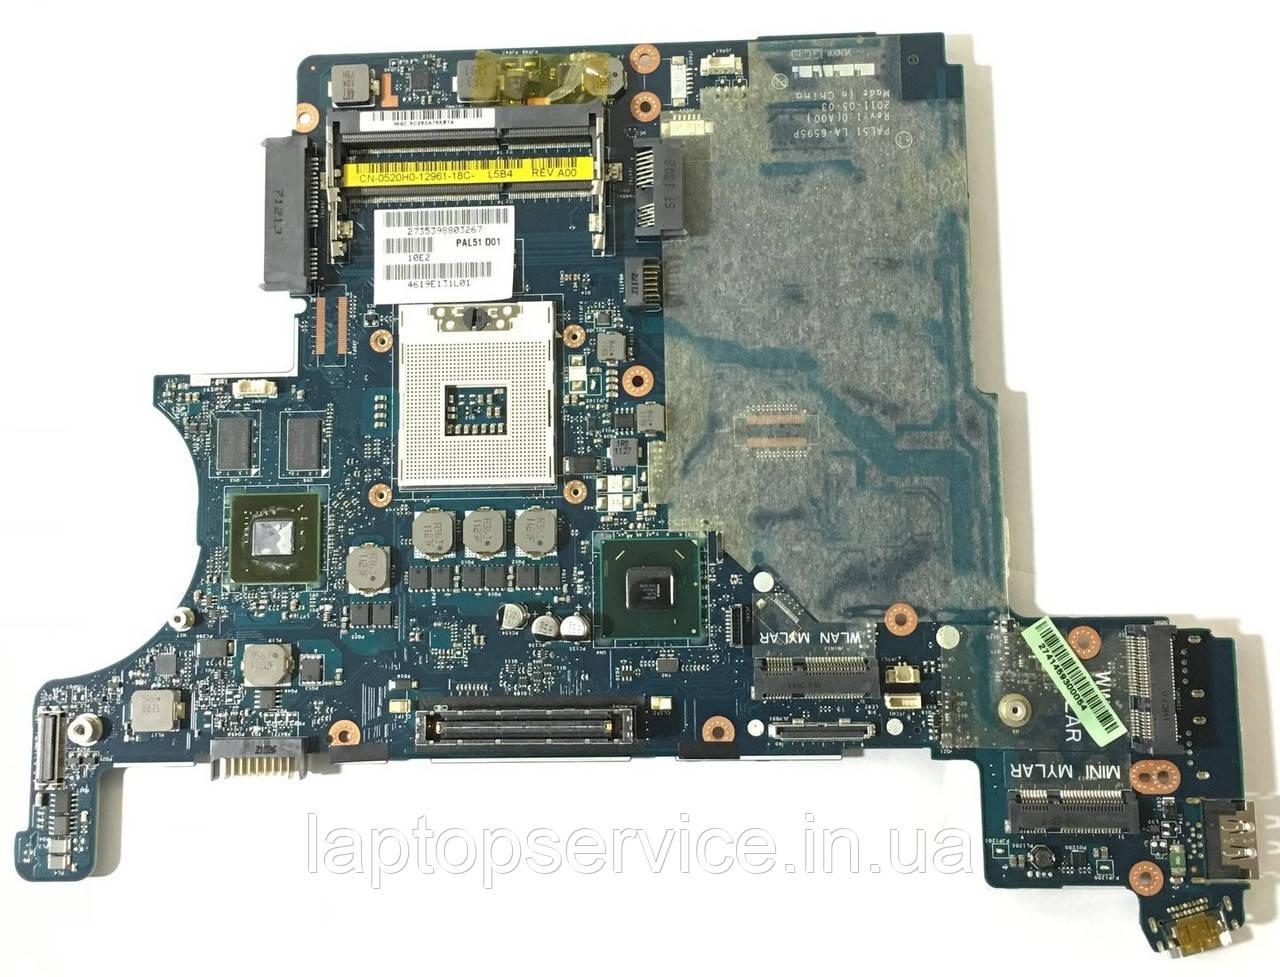 NVIDIA NVS 4200M DRIVERS FOR WINDOWS MAC